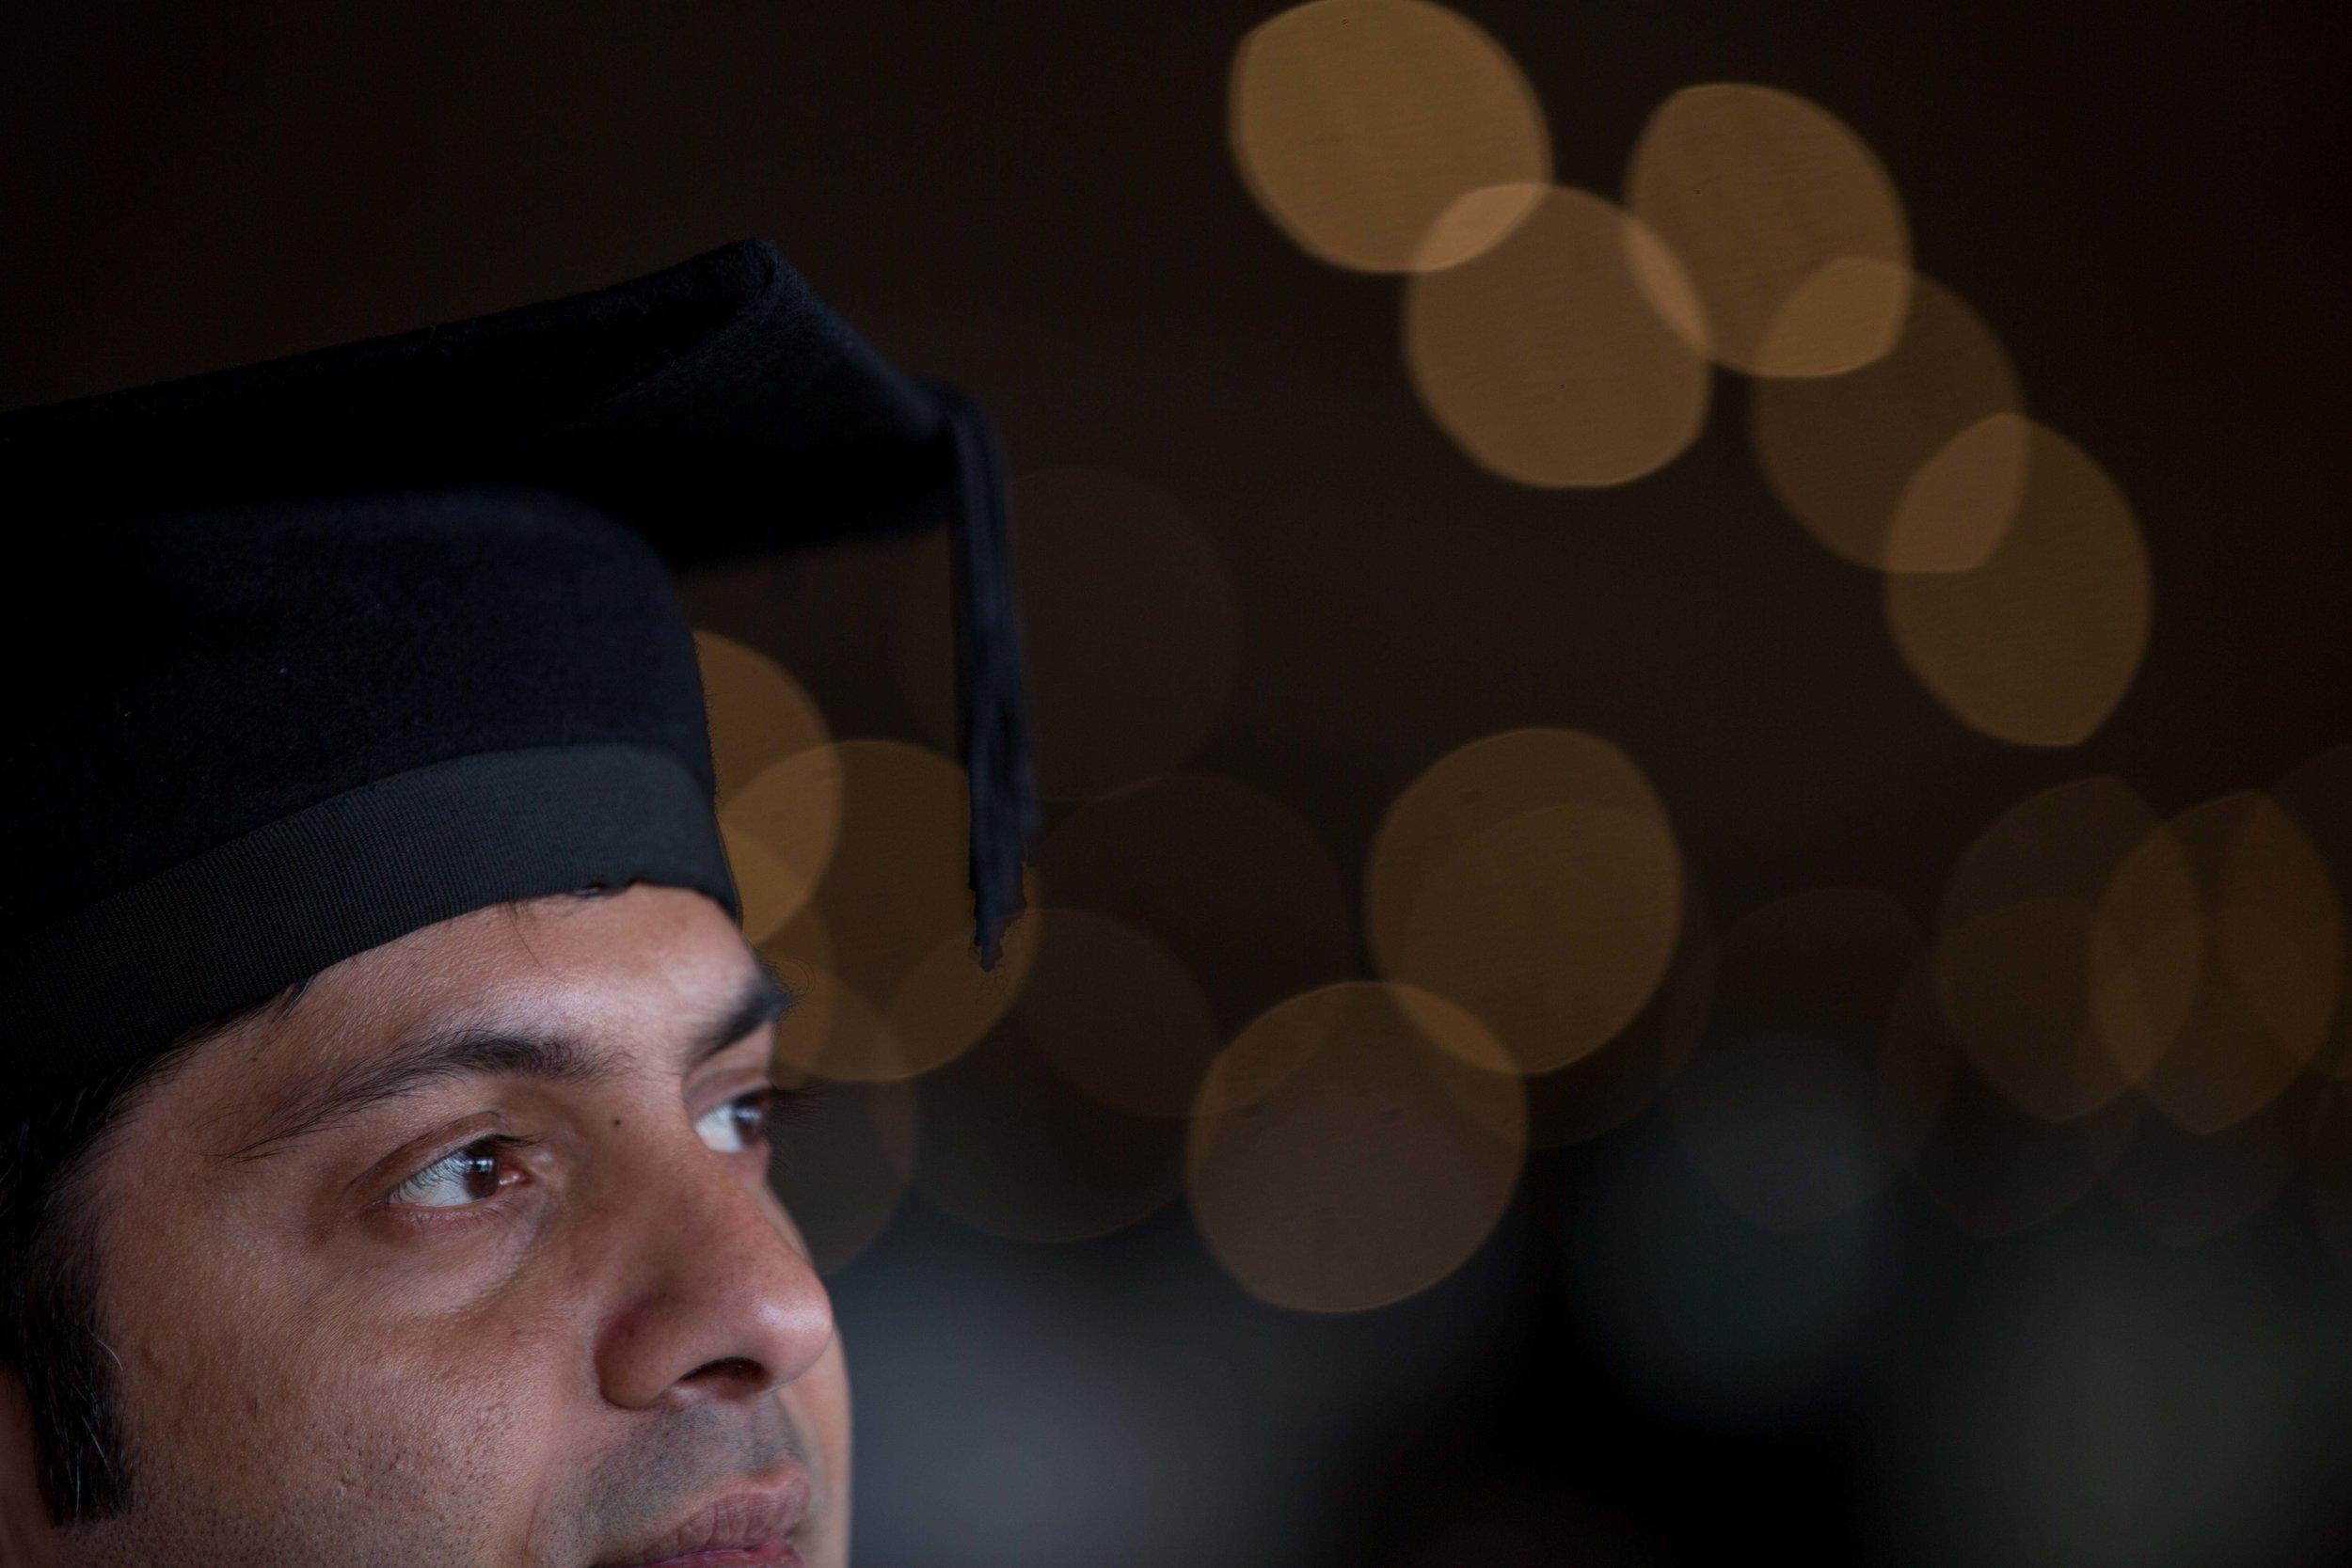 Arden-university-graduation-commercial-photographer-cardiff-natalia-smith-photography-28.jpg